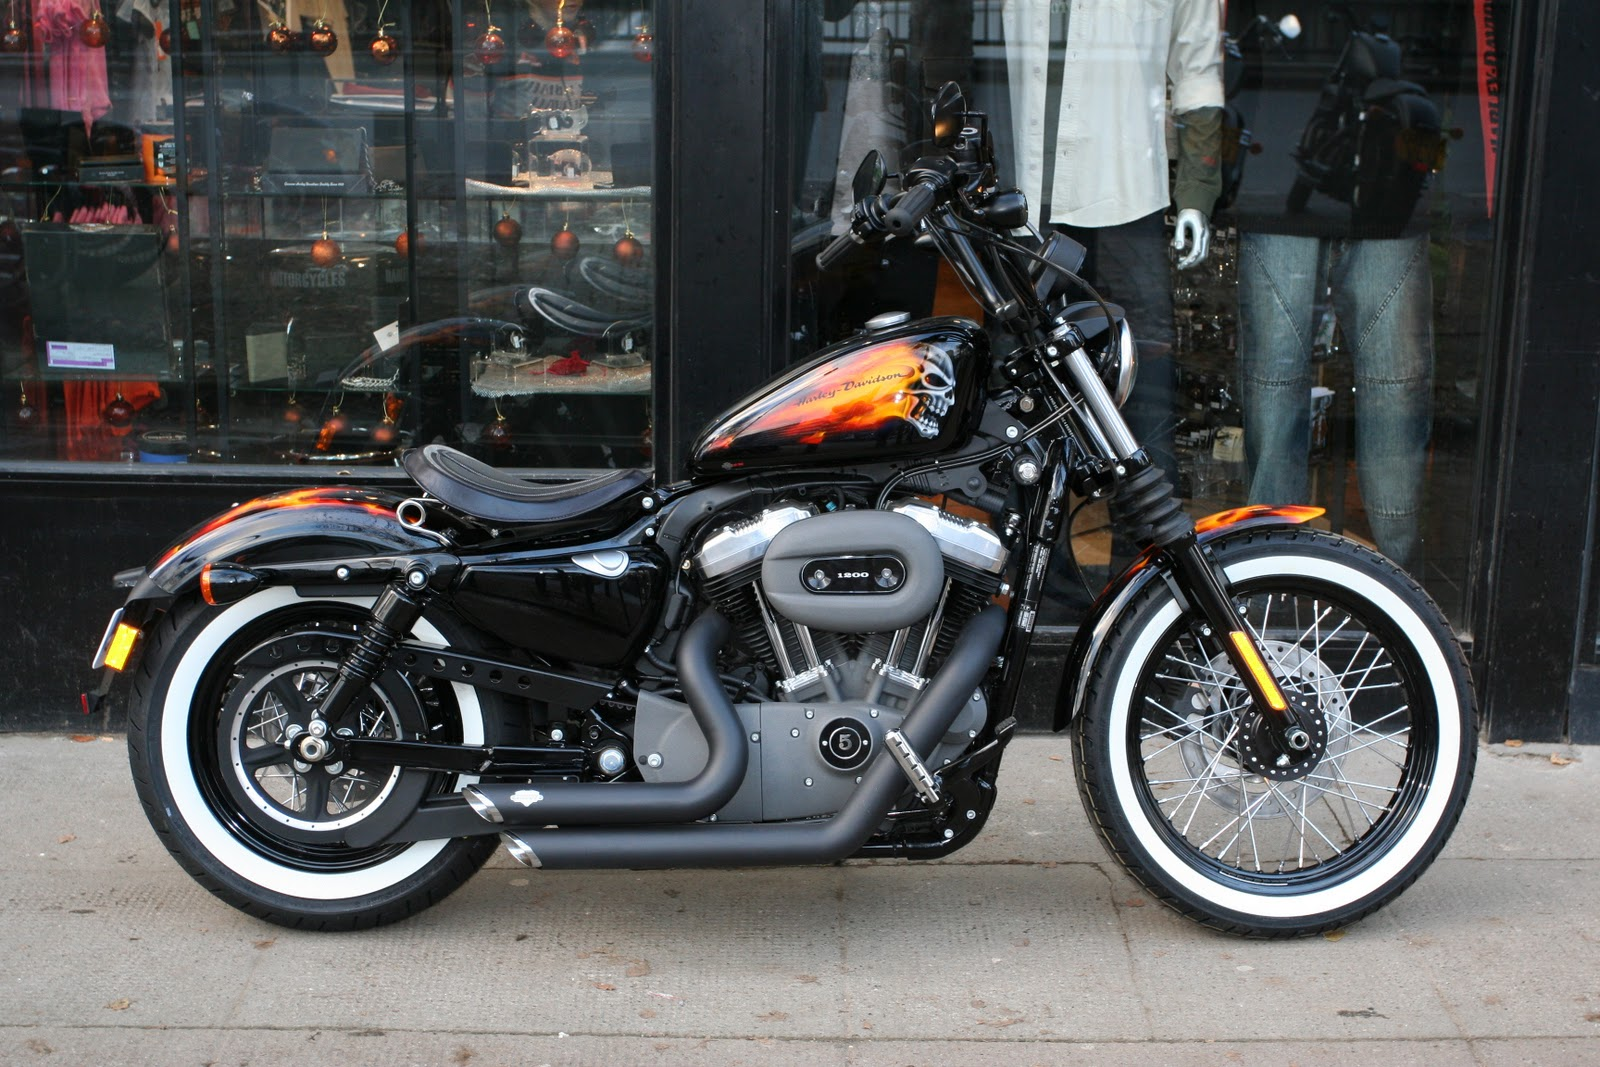 New Harley Davidson: New Motorcycles